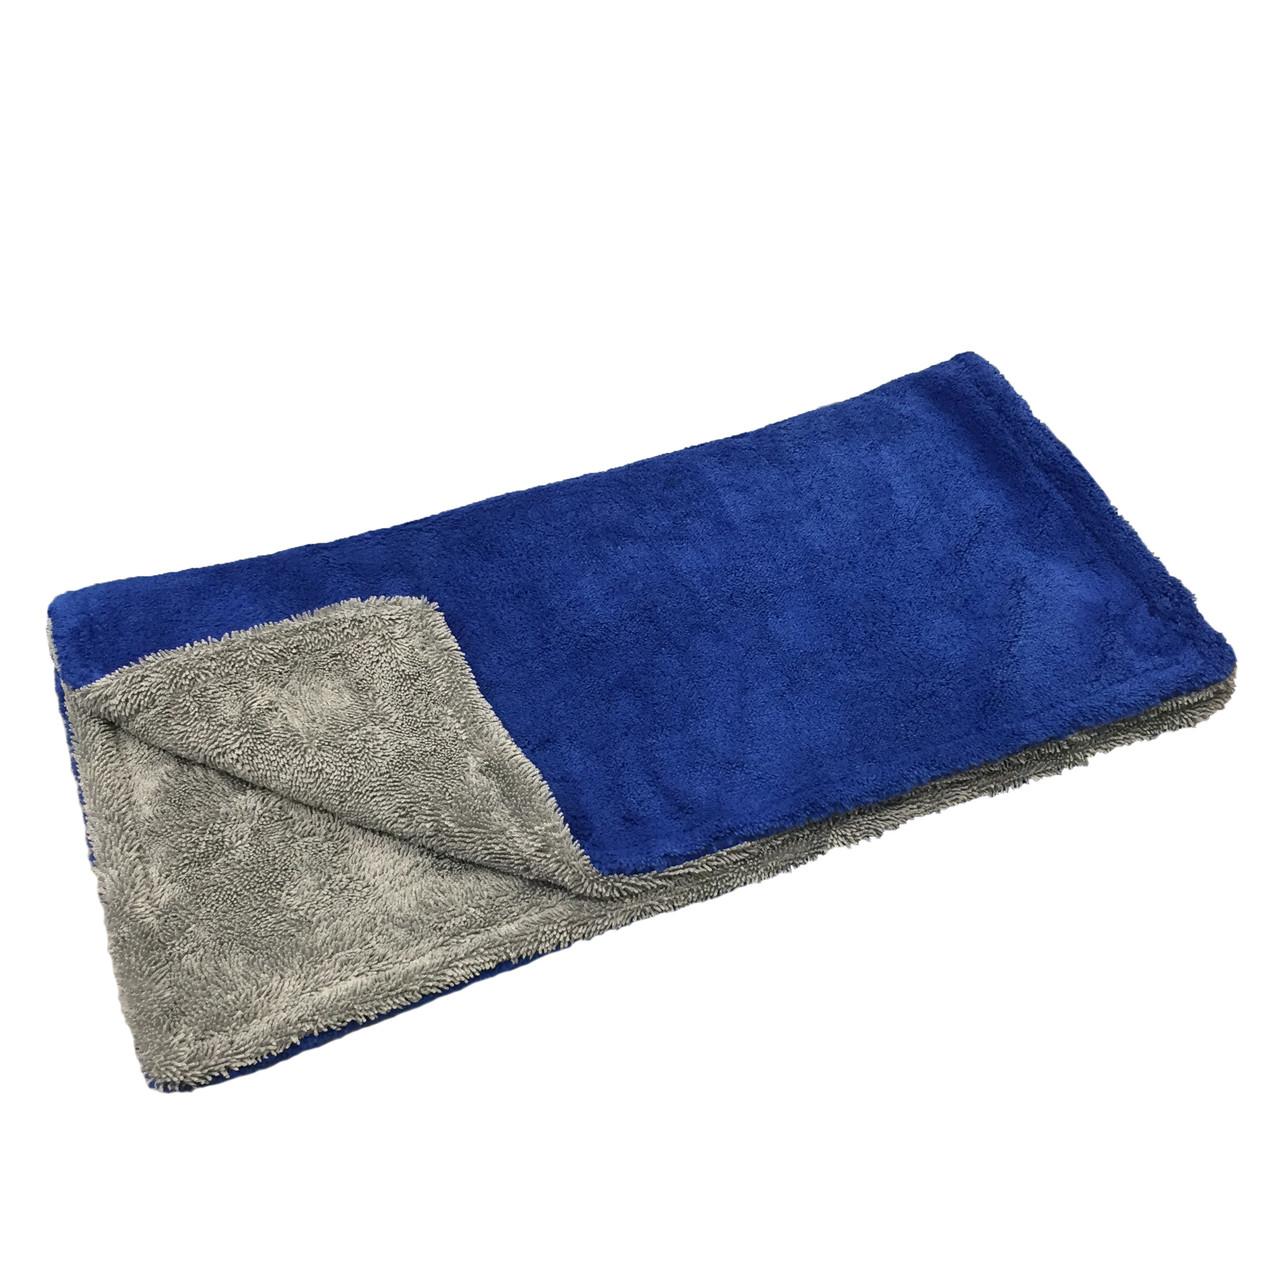 Полотенце для сушки - Autofiber Amphibian 50x75 см. 1100 gsm серо/синее (TTX1100GYB2030-1)